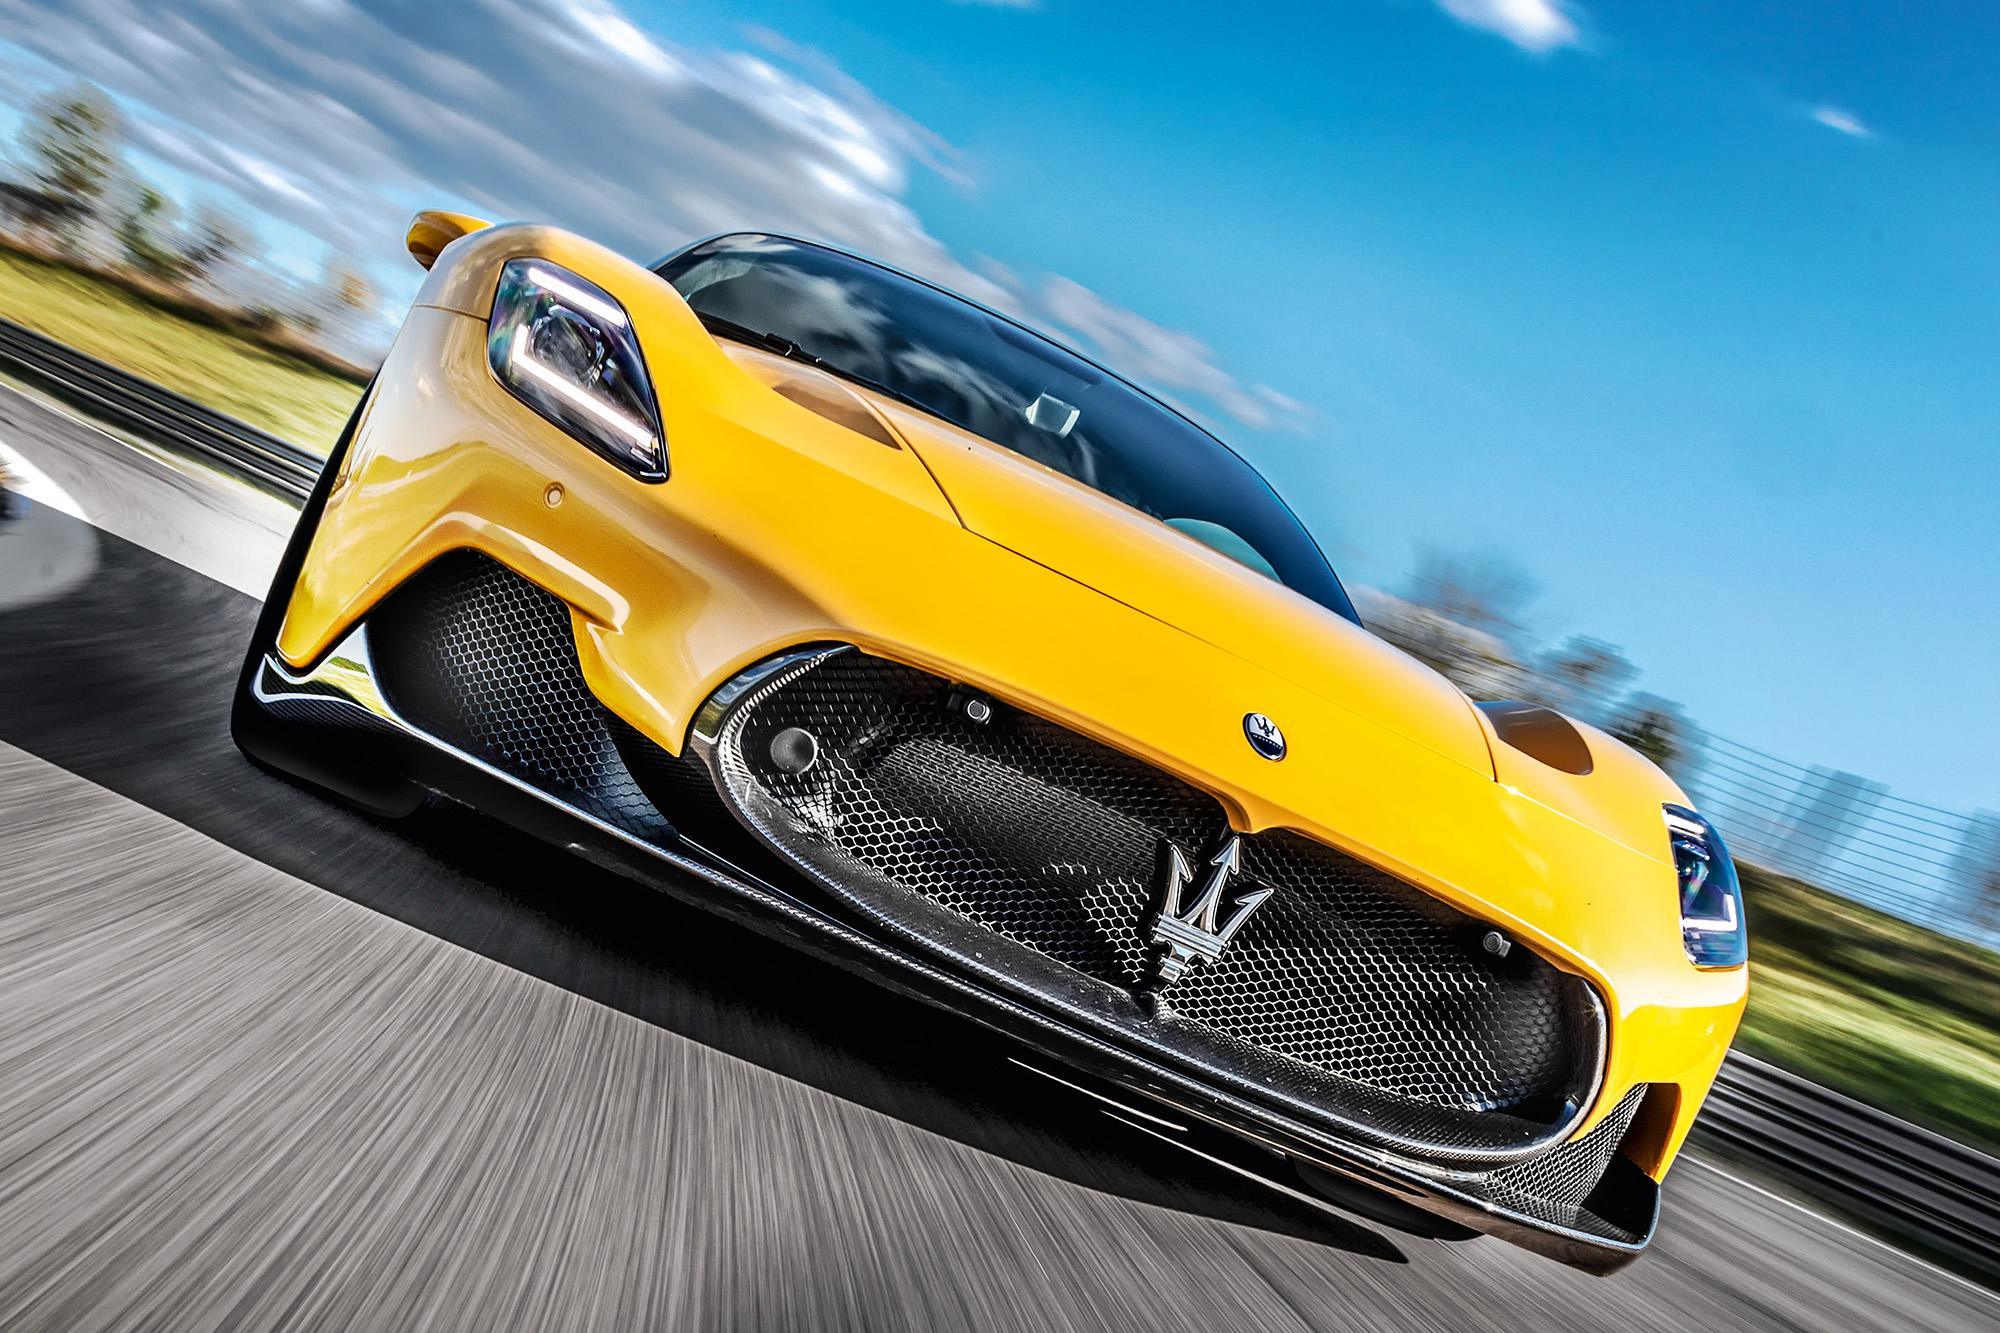 Maserati MC20 amarelo visto de frente